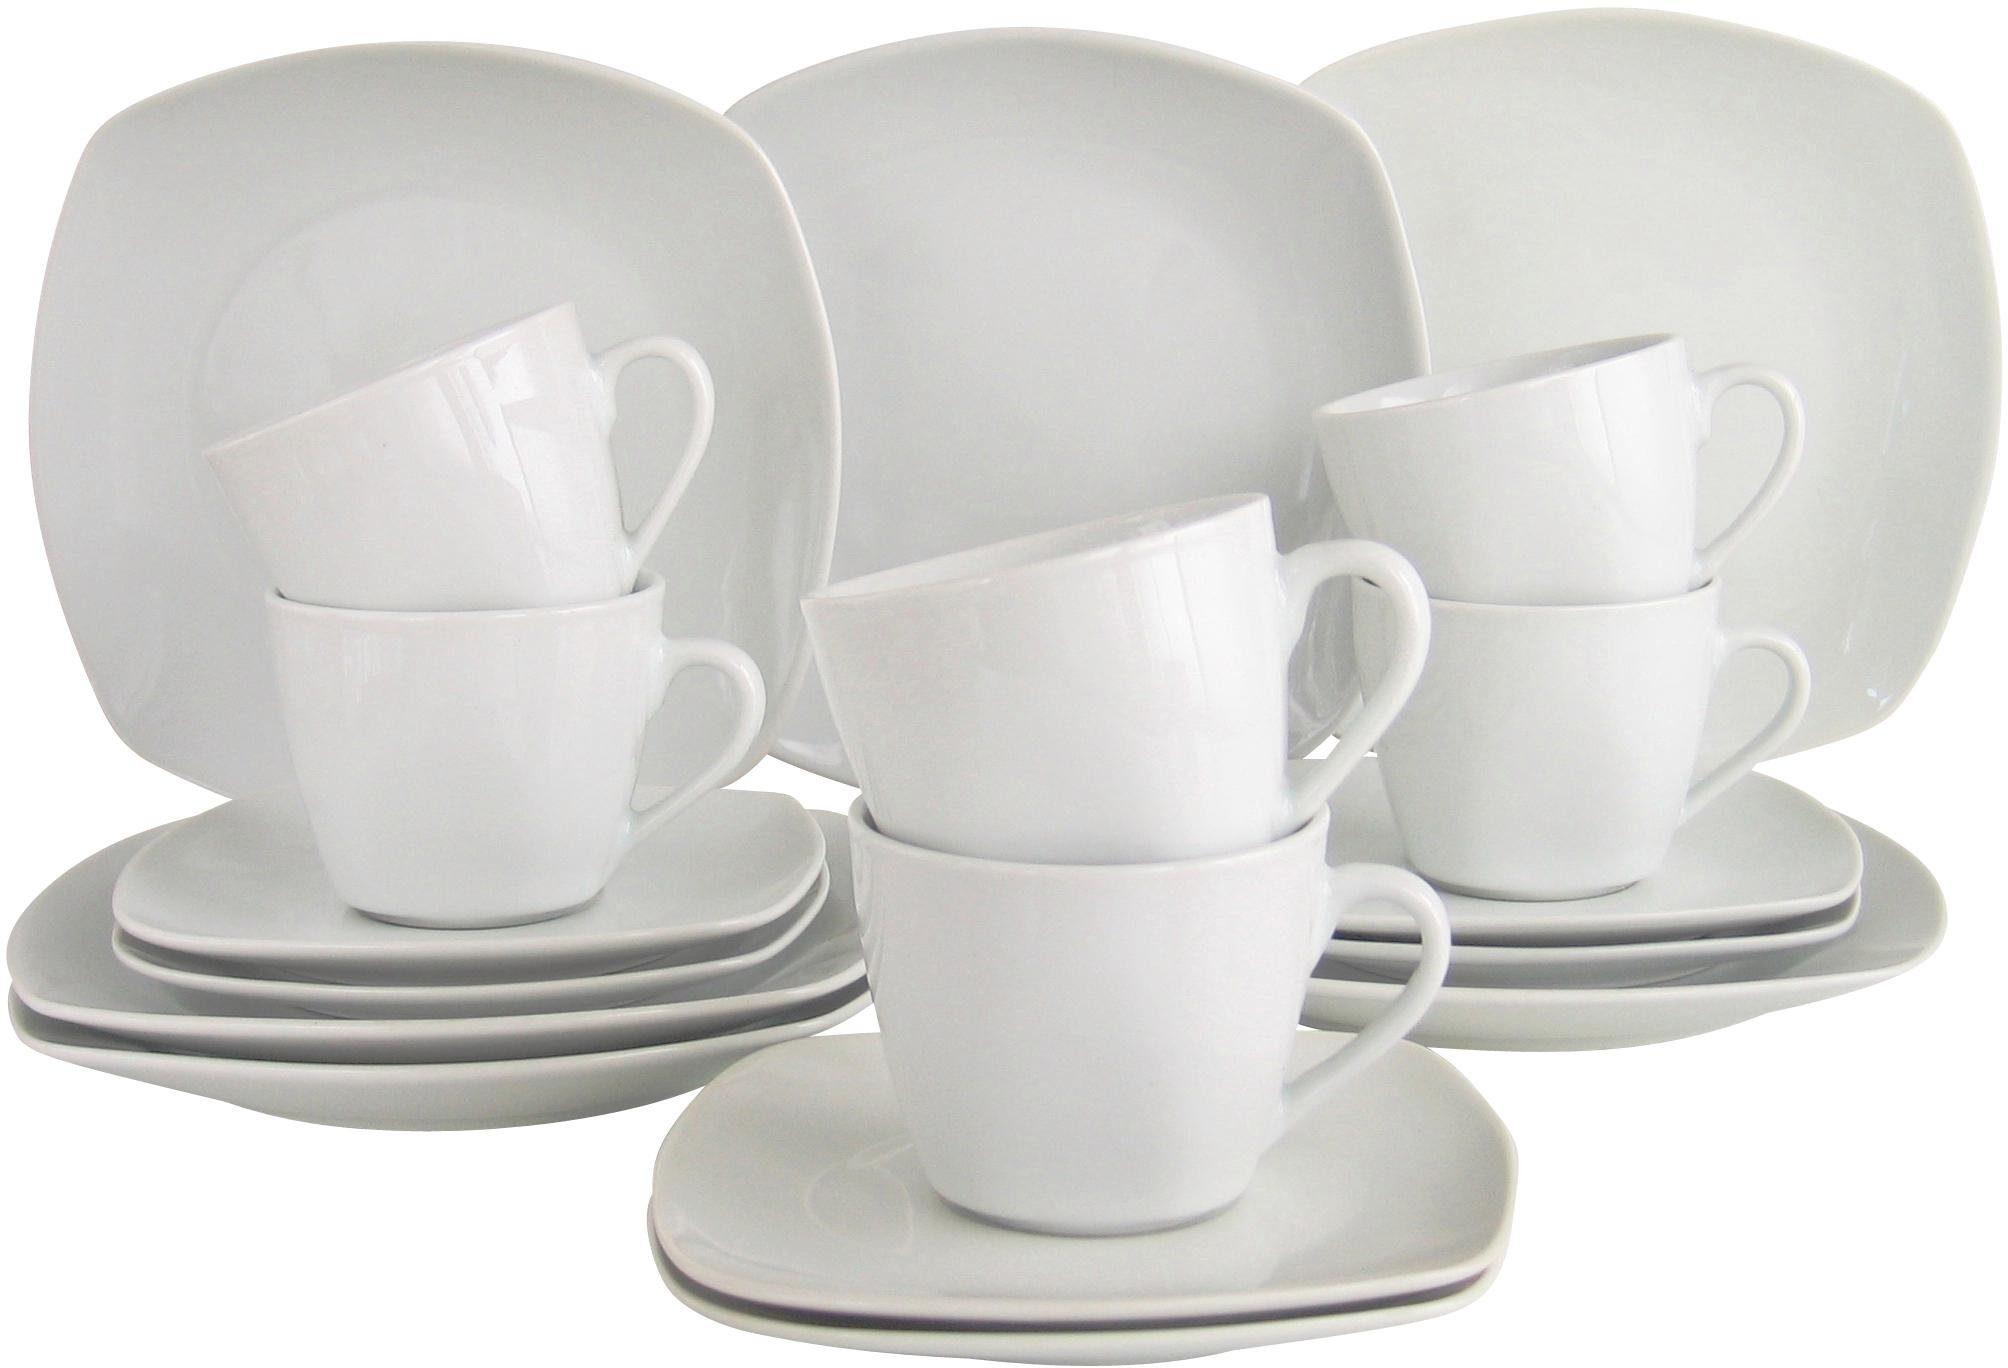 CreaTable Kaffeeservice, Porzellan, 18 Teile, »Blanco«